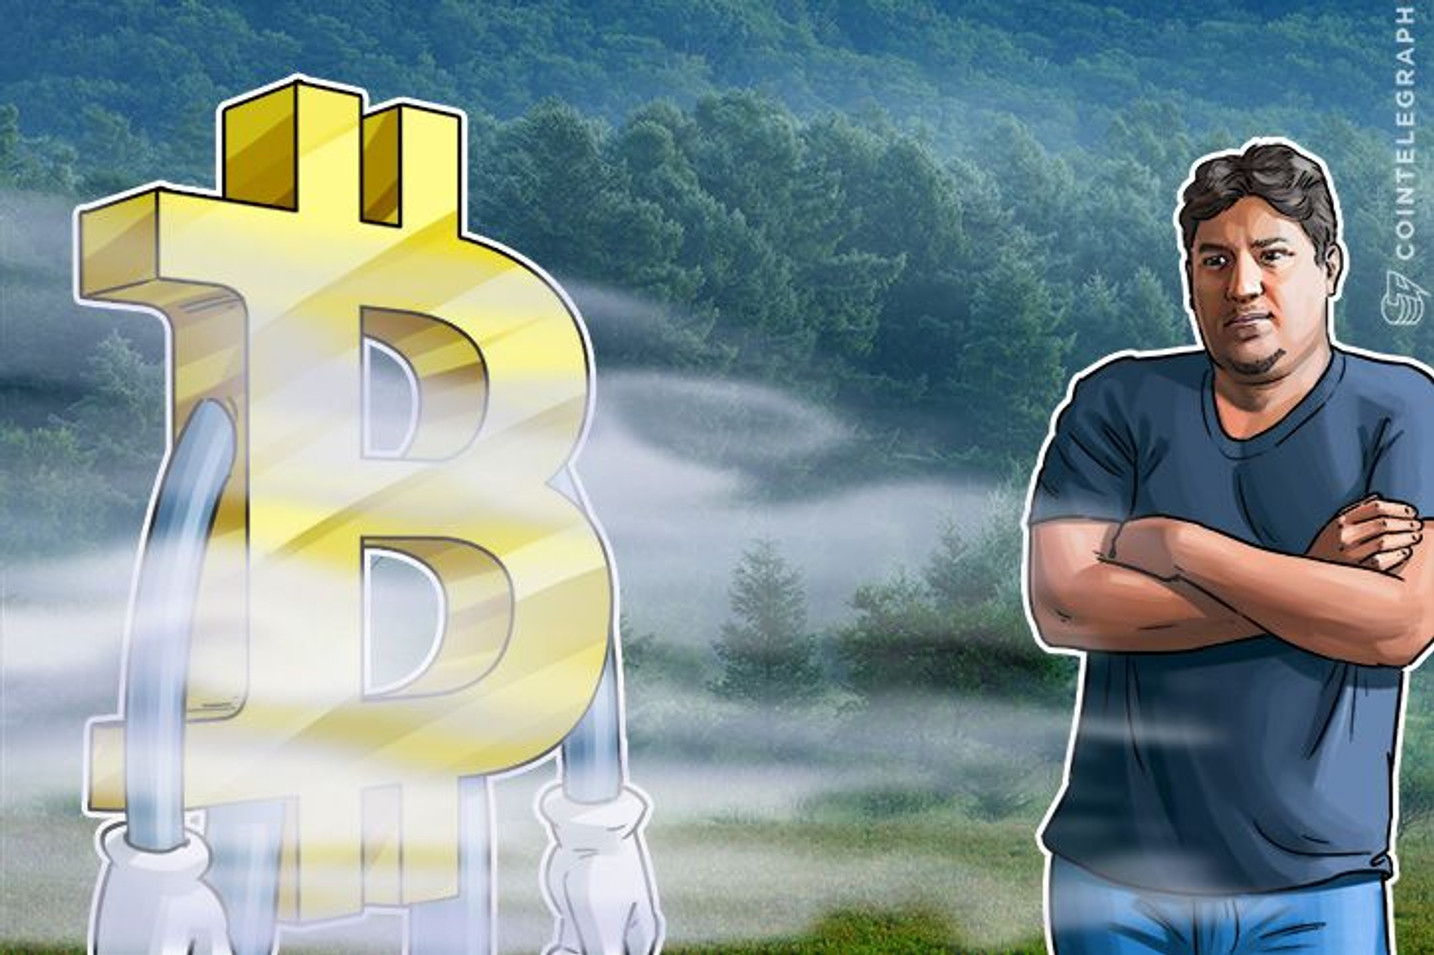 Chance of $1Mln Bitcoin 0.25%: Vinny Lingham